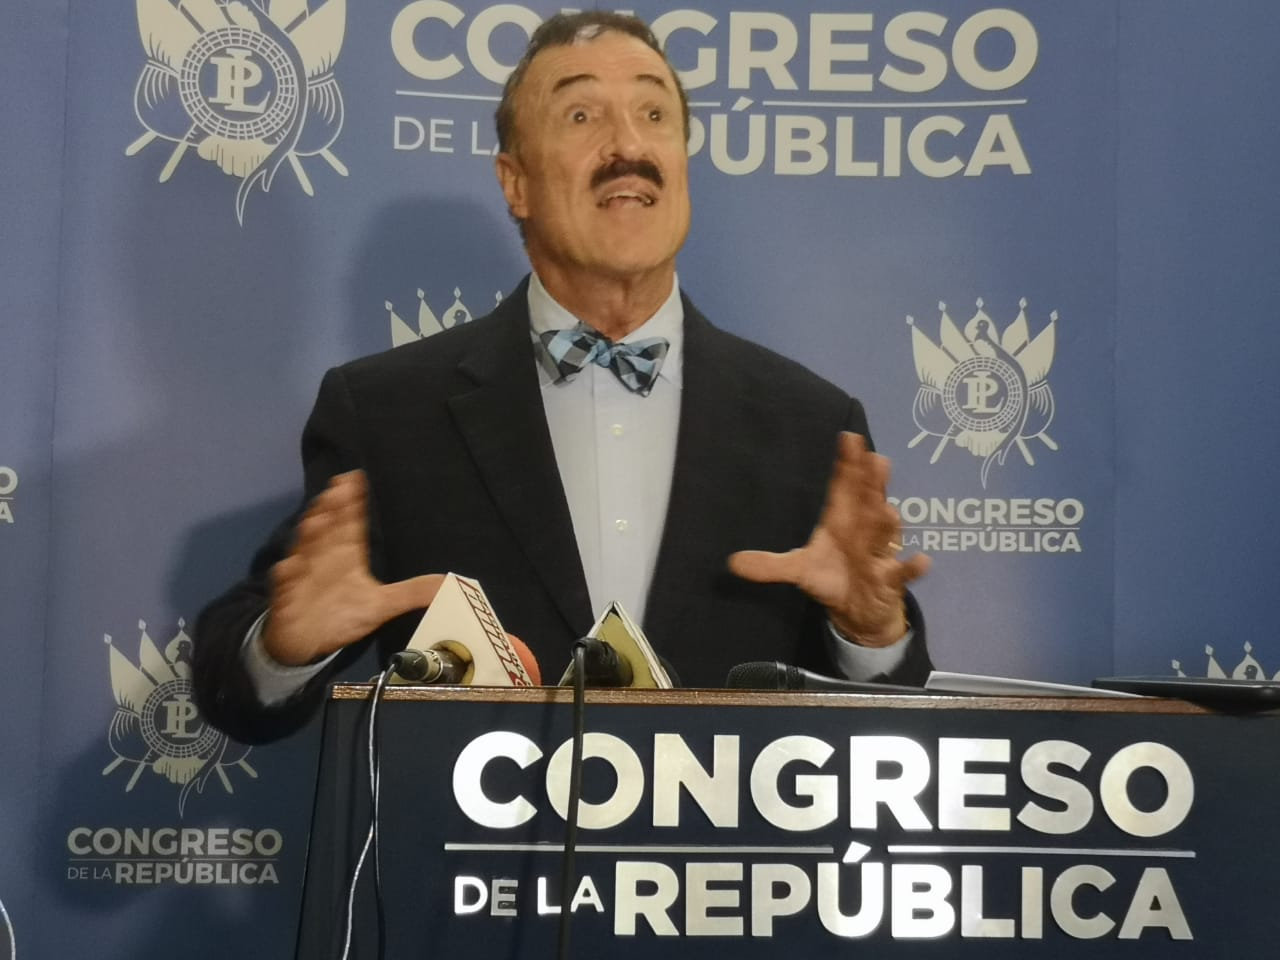 Fernando Linares Beltranena